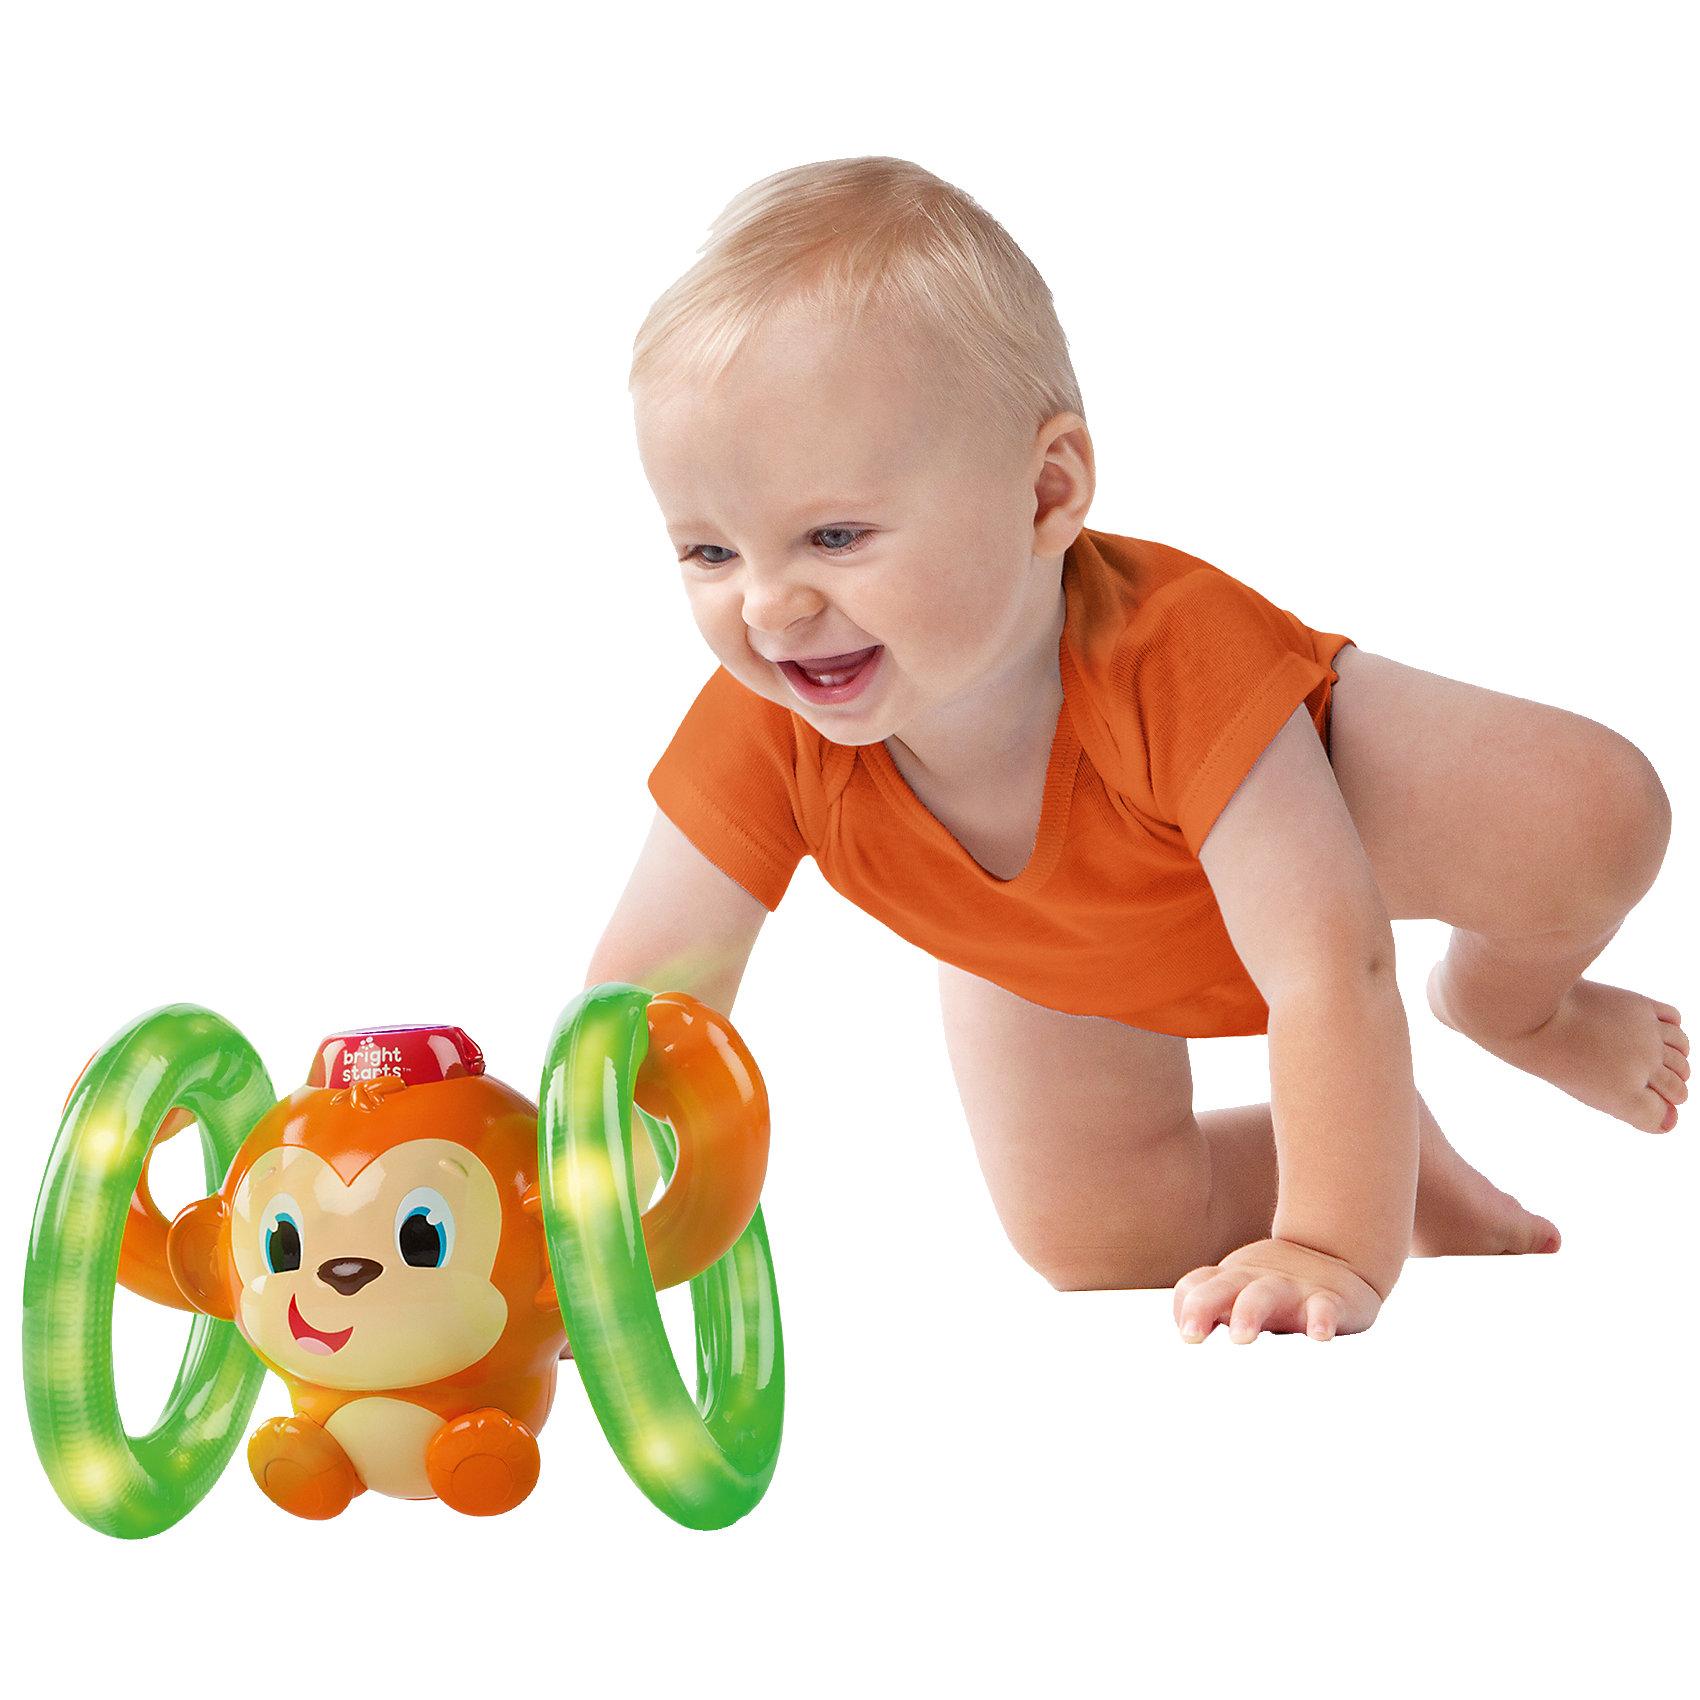 Kids II Развивающая игрушка «Обезьянка на кольцах», Bright Starts мягкие игрушки amico развивающая игрушка обезьянка